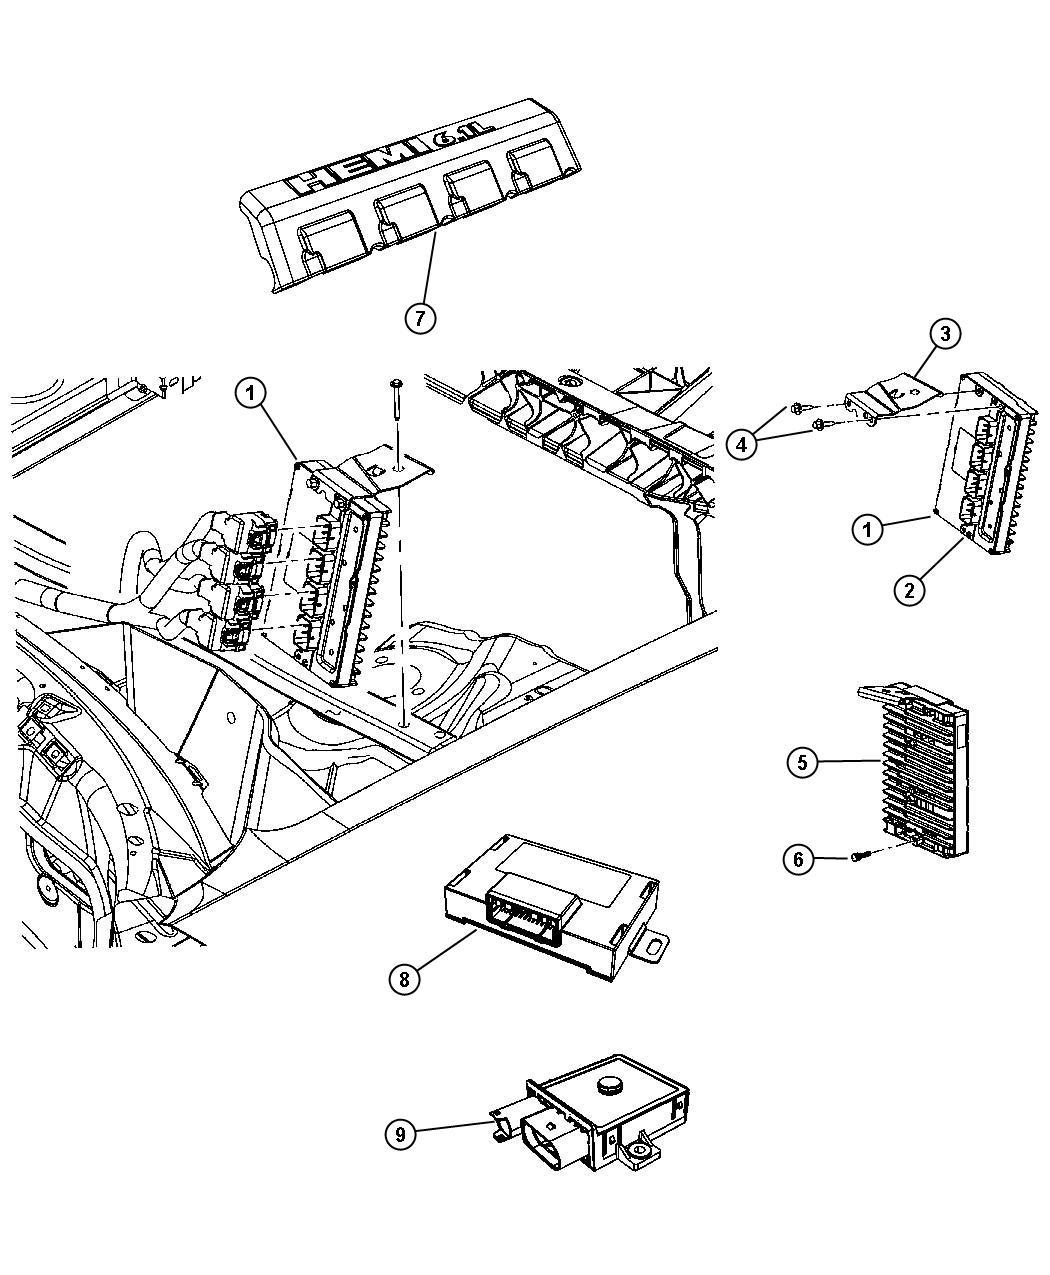 2009 Dodge Challenger R/T 5.7L Hemi V8 A/T Module